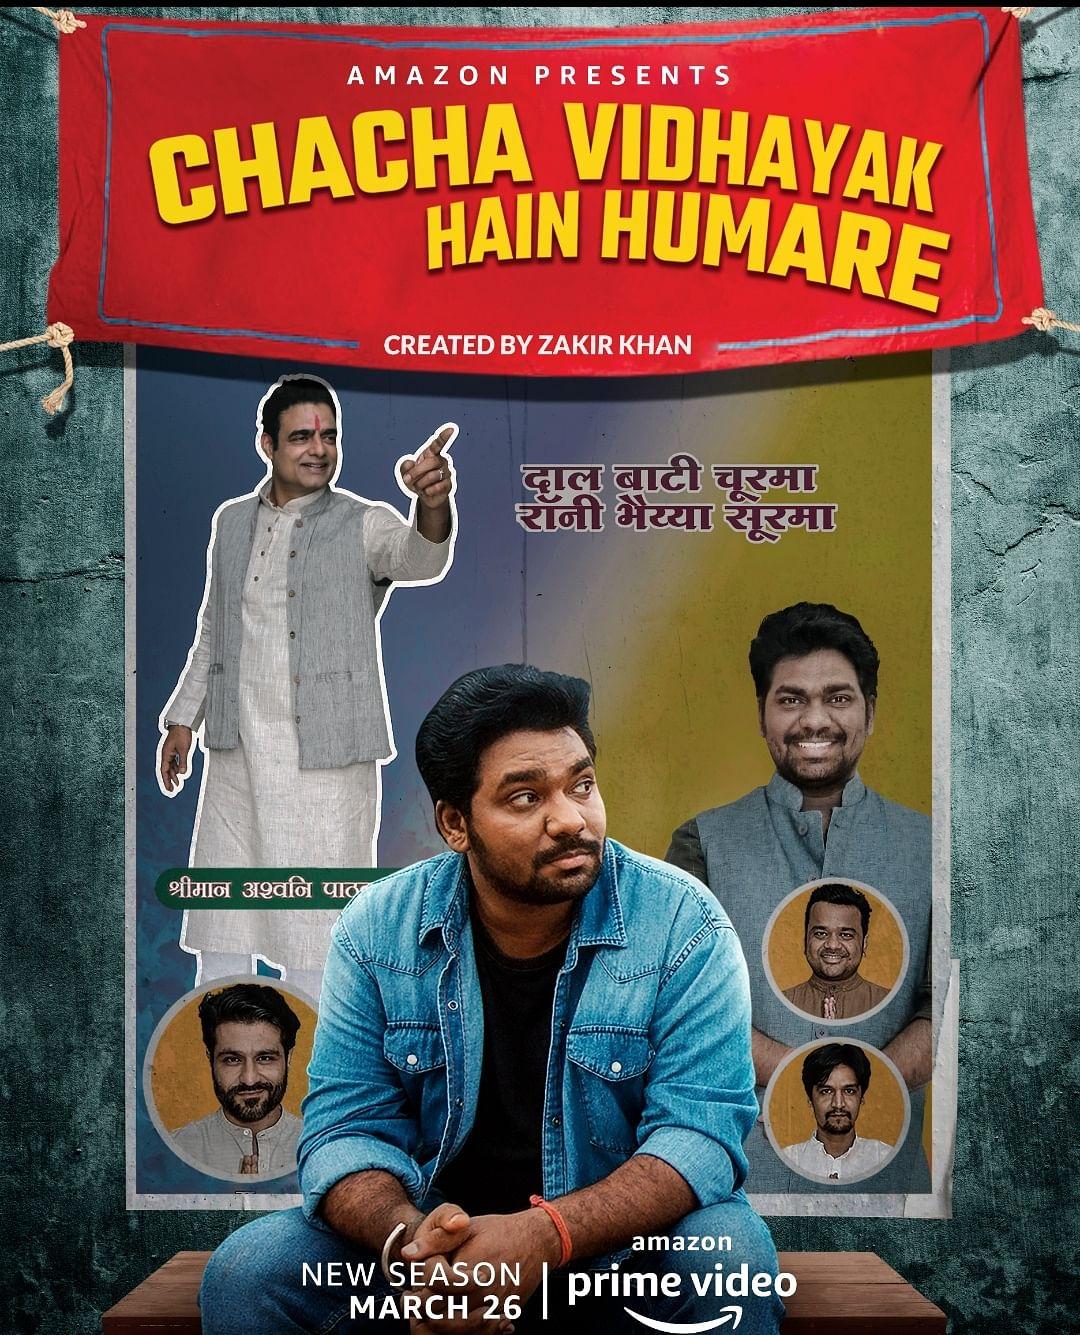 Zakir Khan's Chacha Vidhayak Hain Humare S2 To Release on Amazon